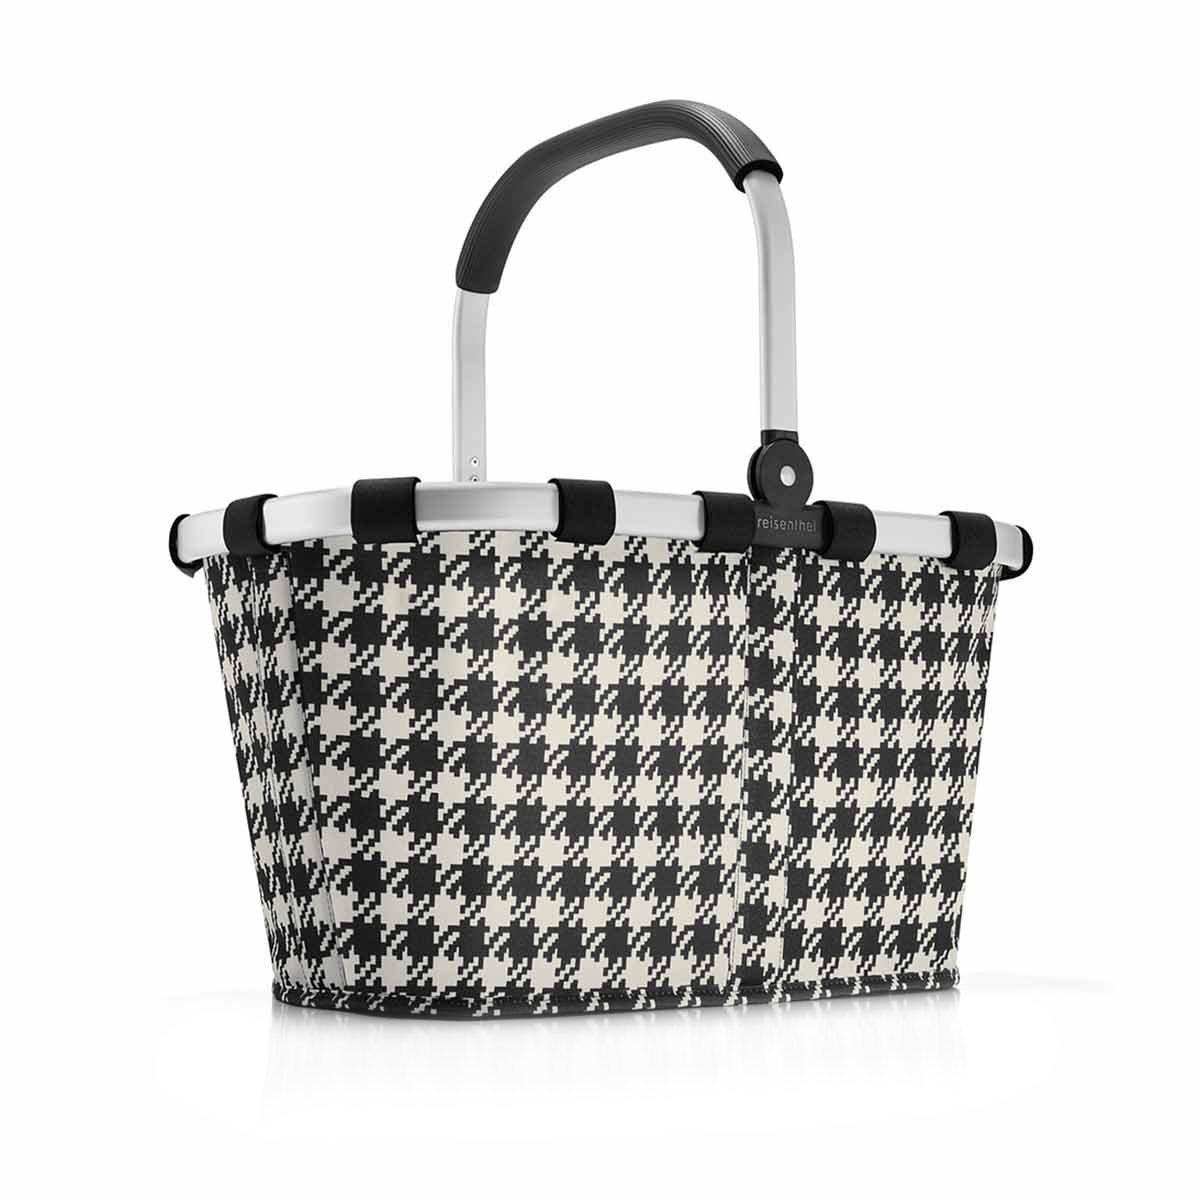 Reisenthel - Einkaufskorb carrybag Fifties, Black BK7028